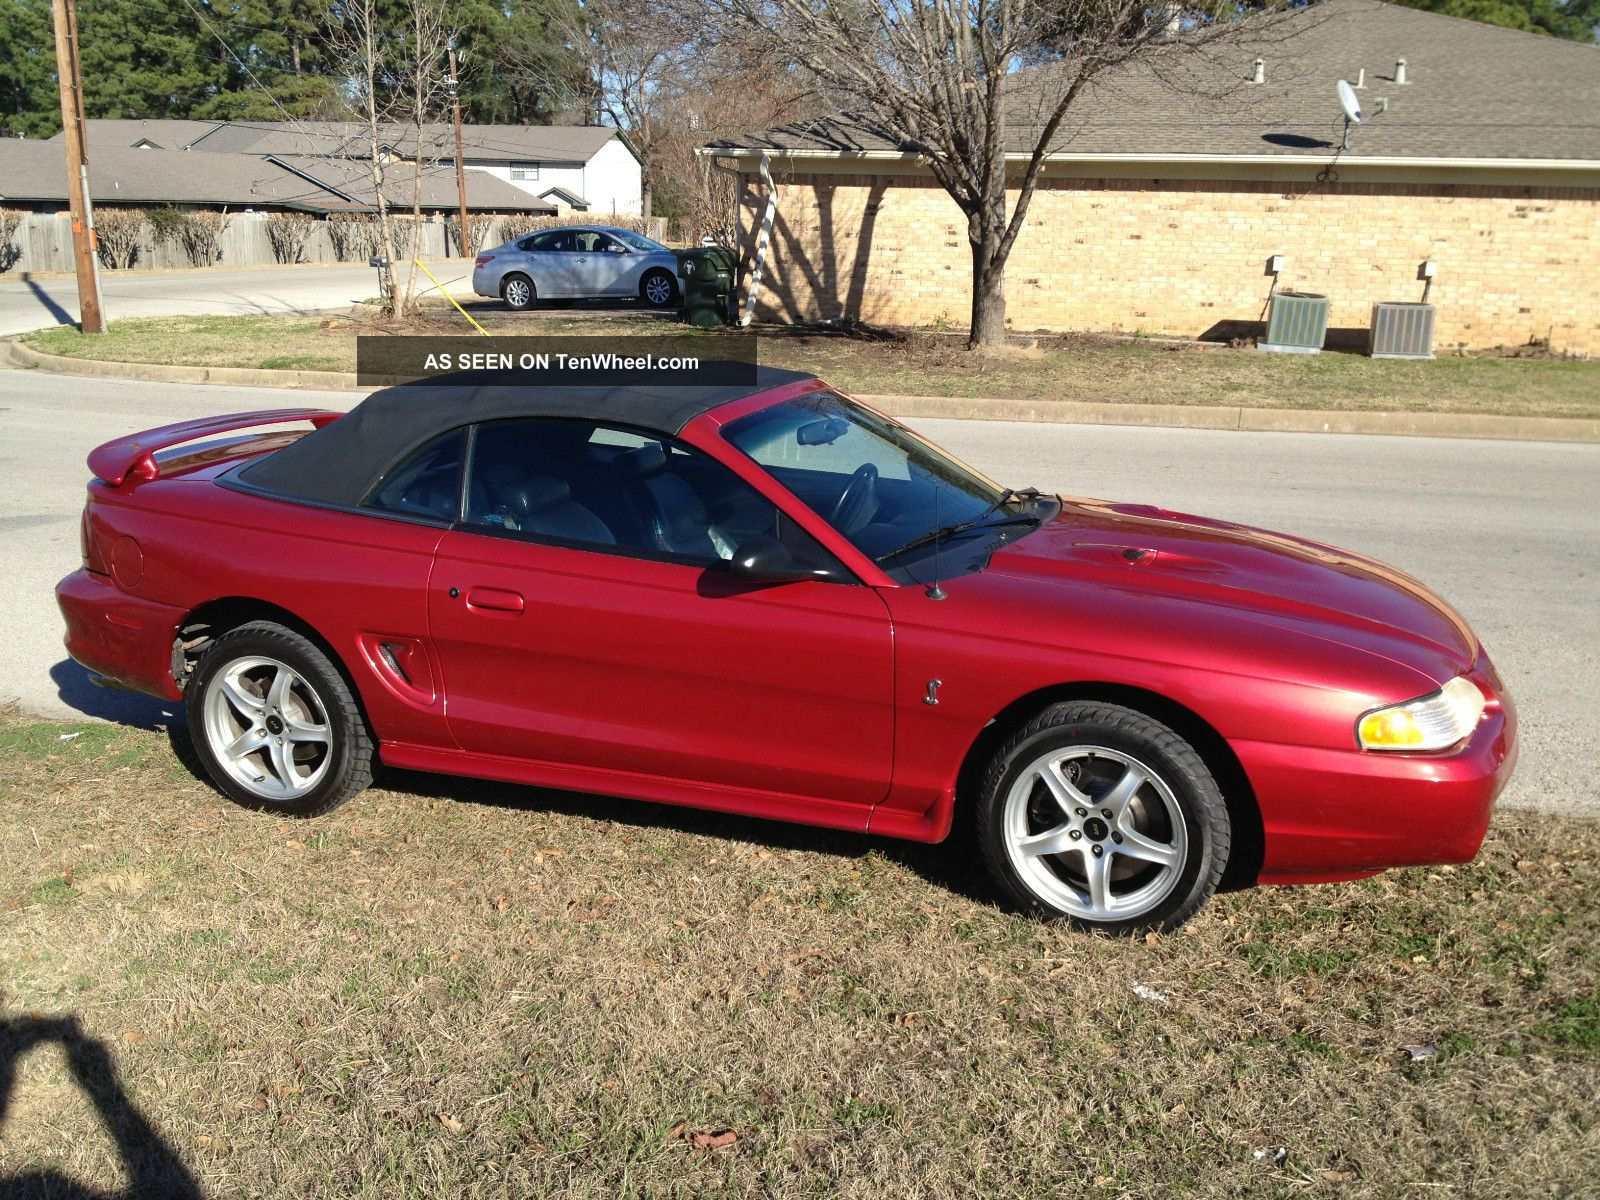 1998 Ford Mustang Svt Cobra Convertible